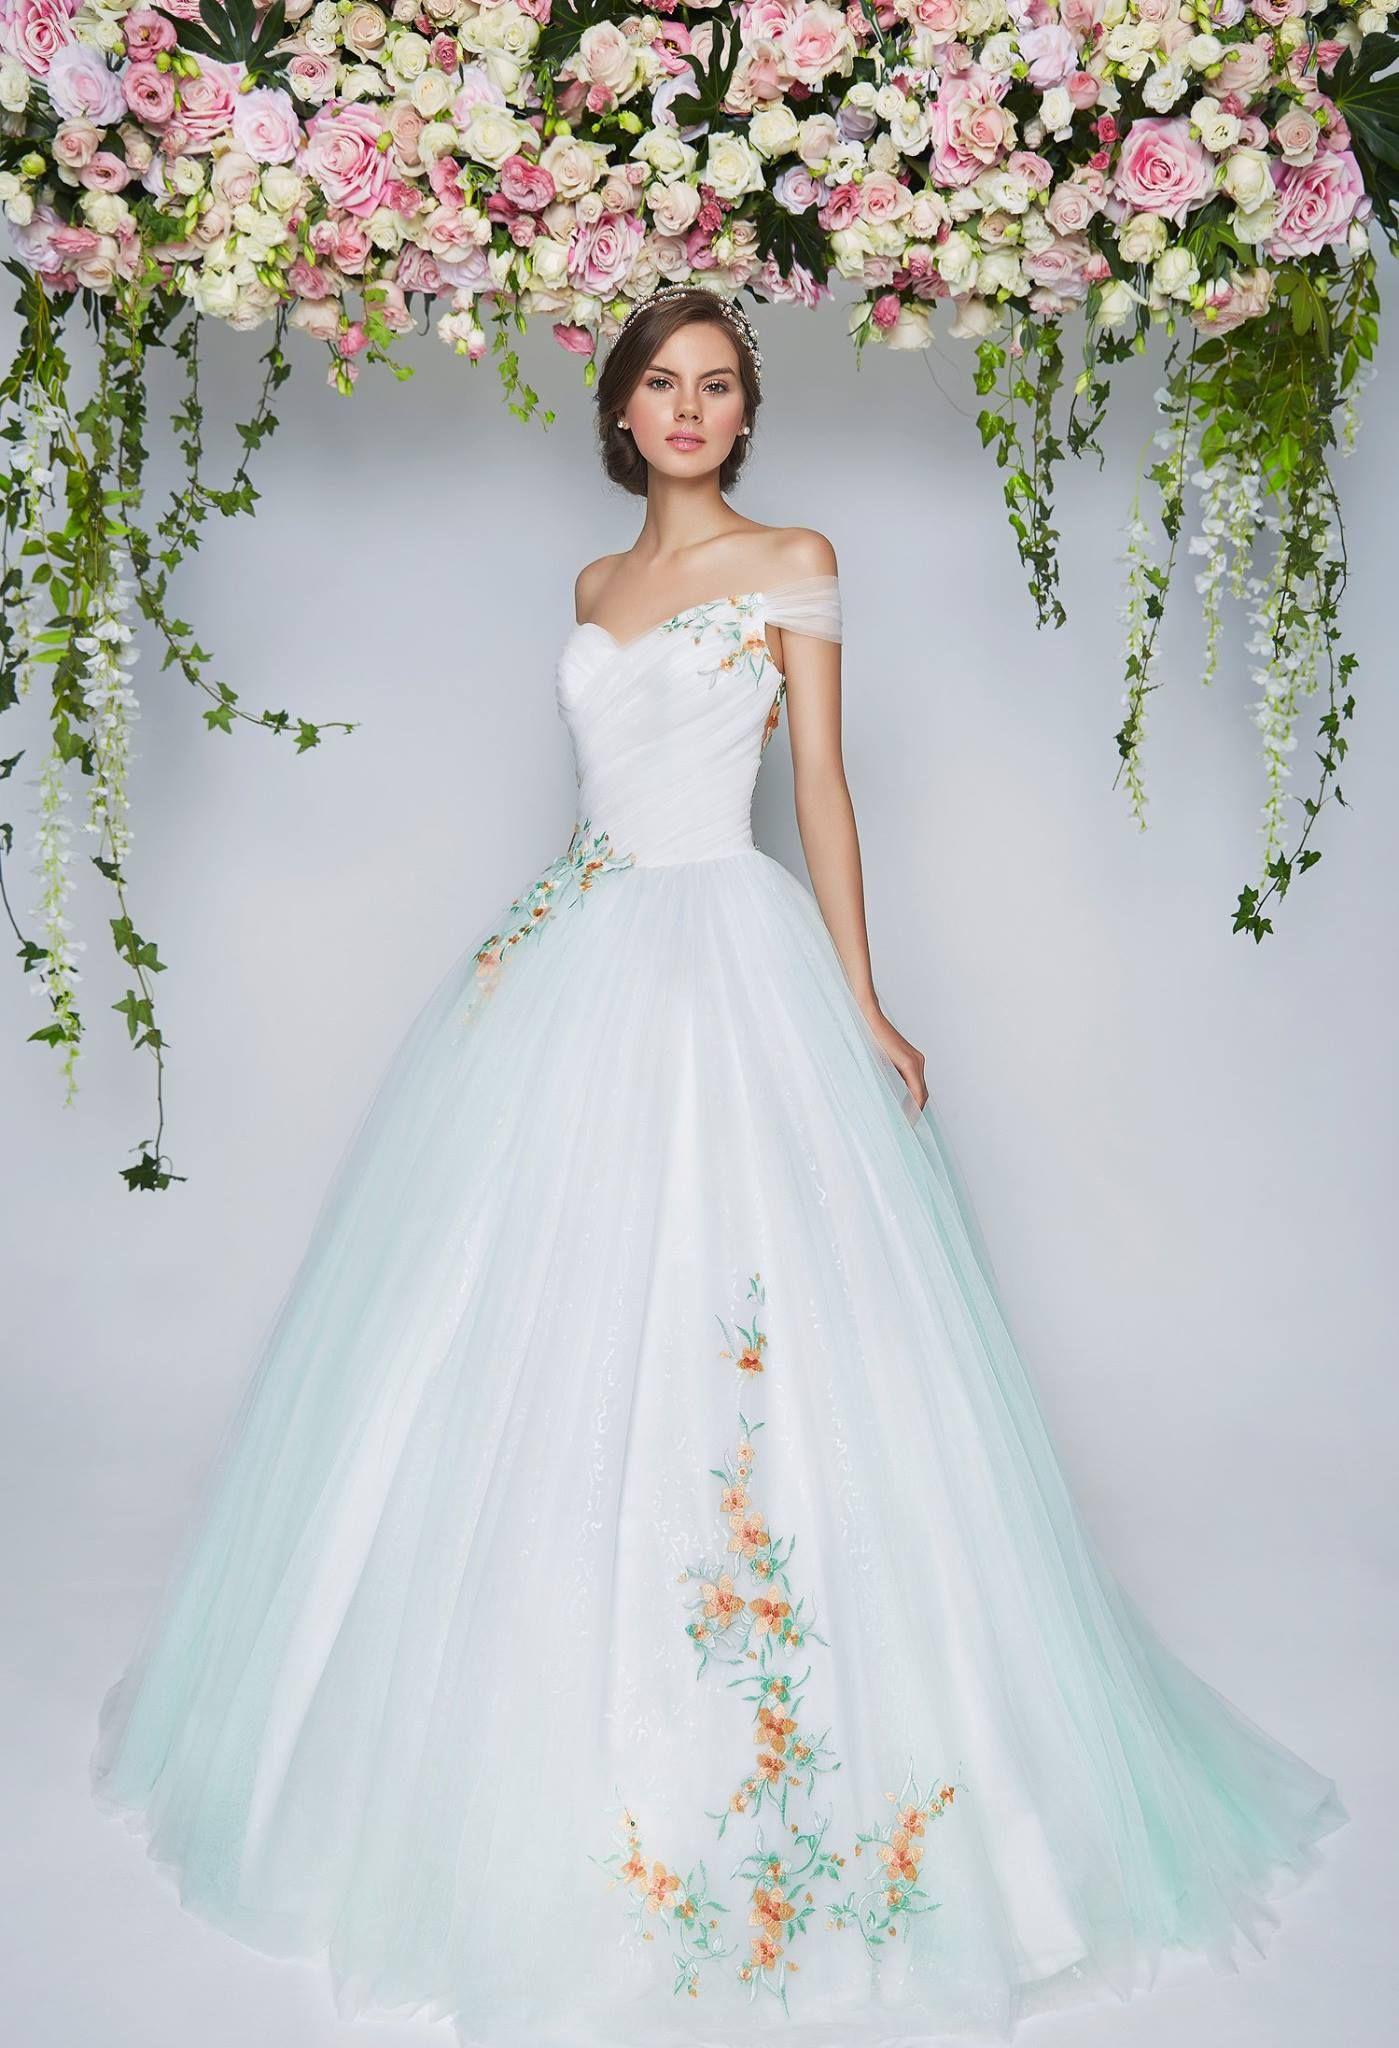 Light blue off shoulder wedding gown embroidered flowers